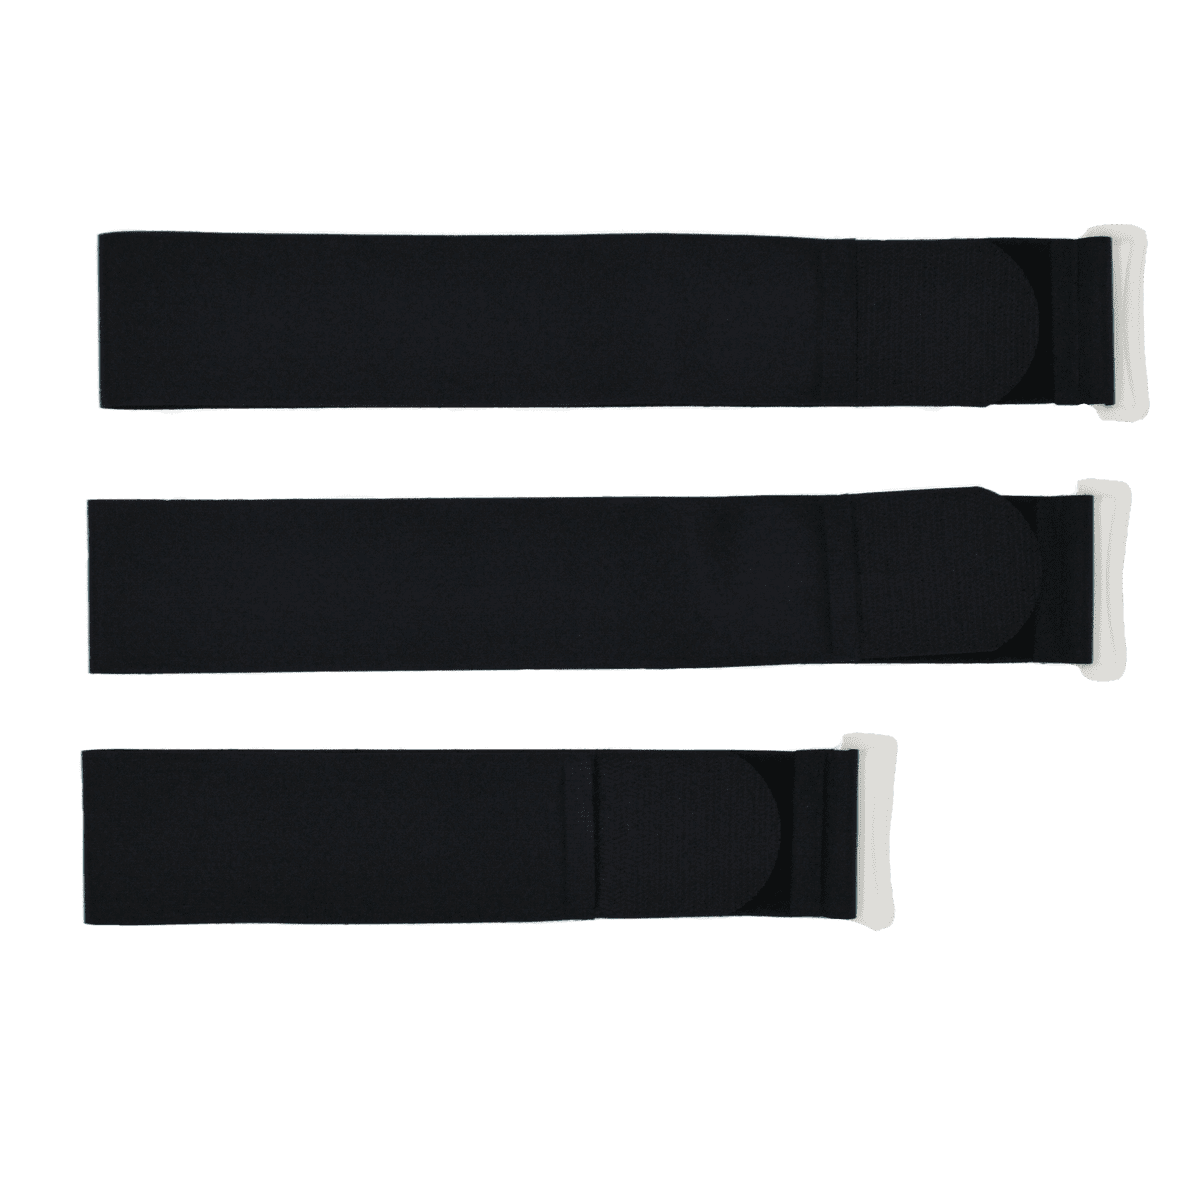 Secure Radial Board